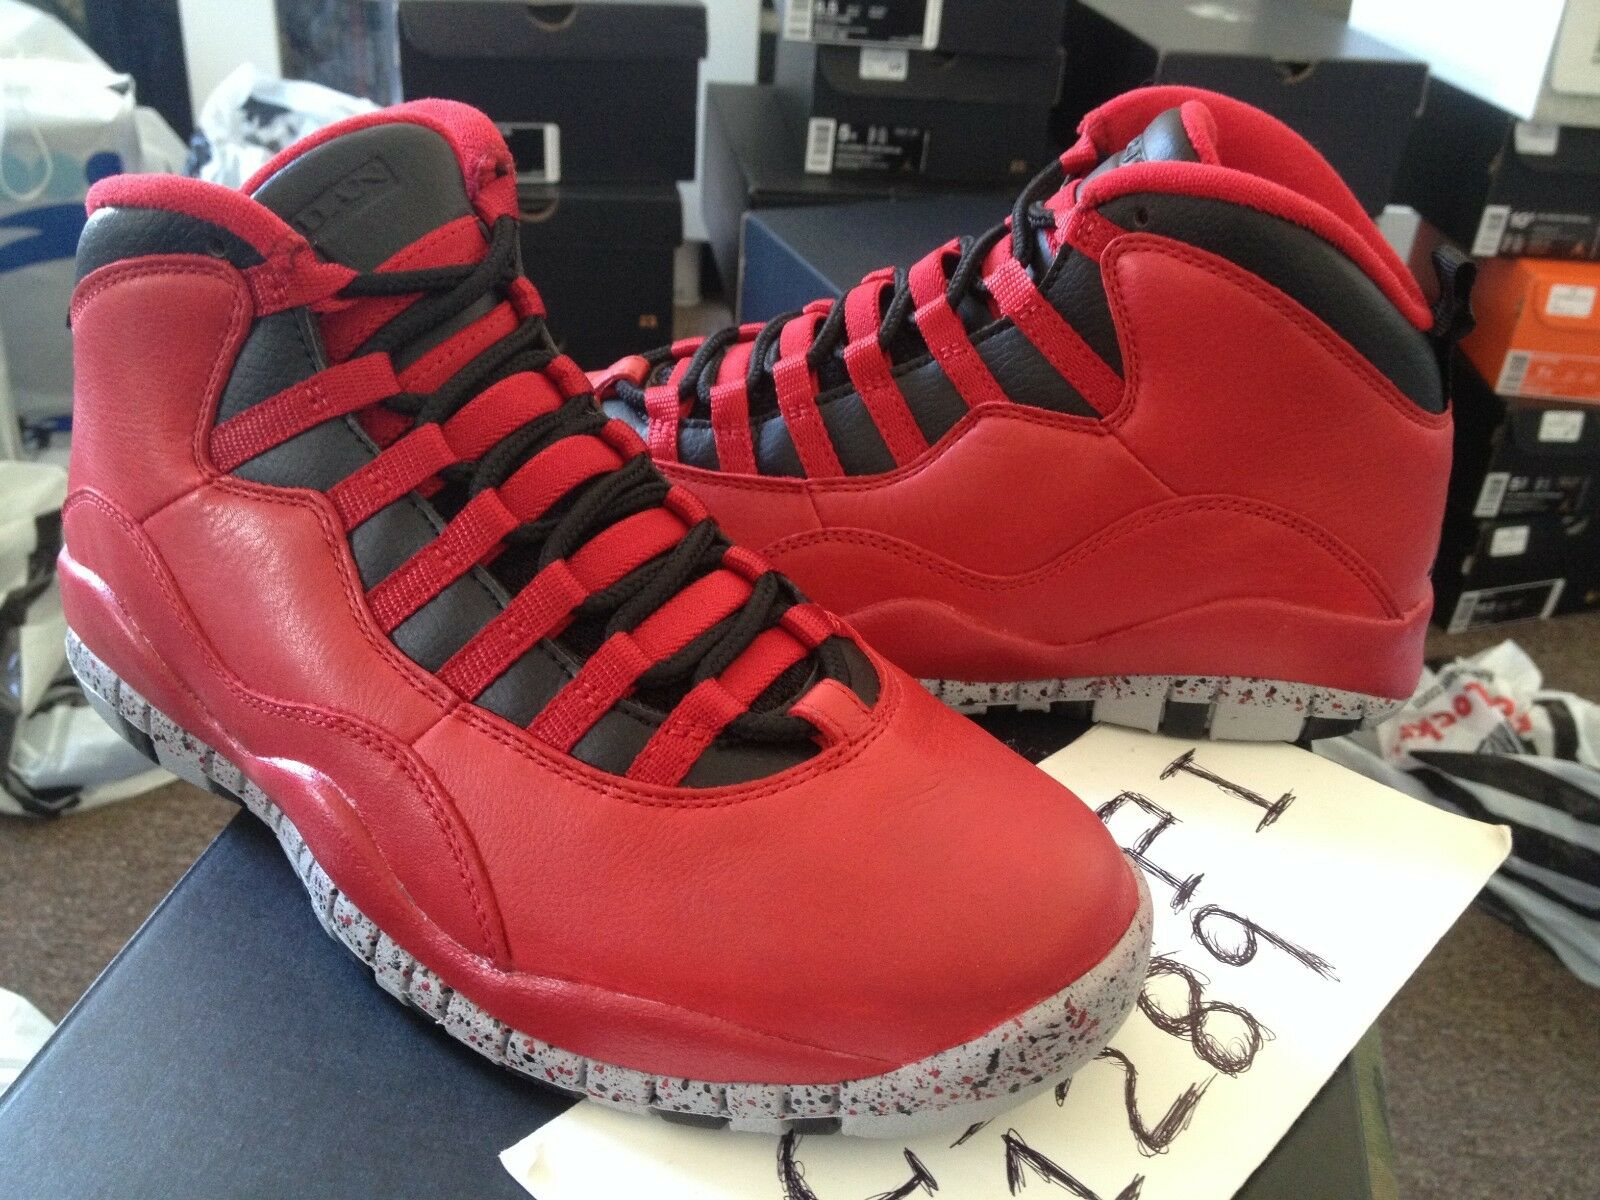 Nike air jordan retrò x 10 tori su broadway palestra red lupo nero 705178-601